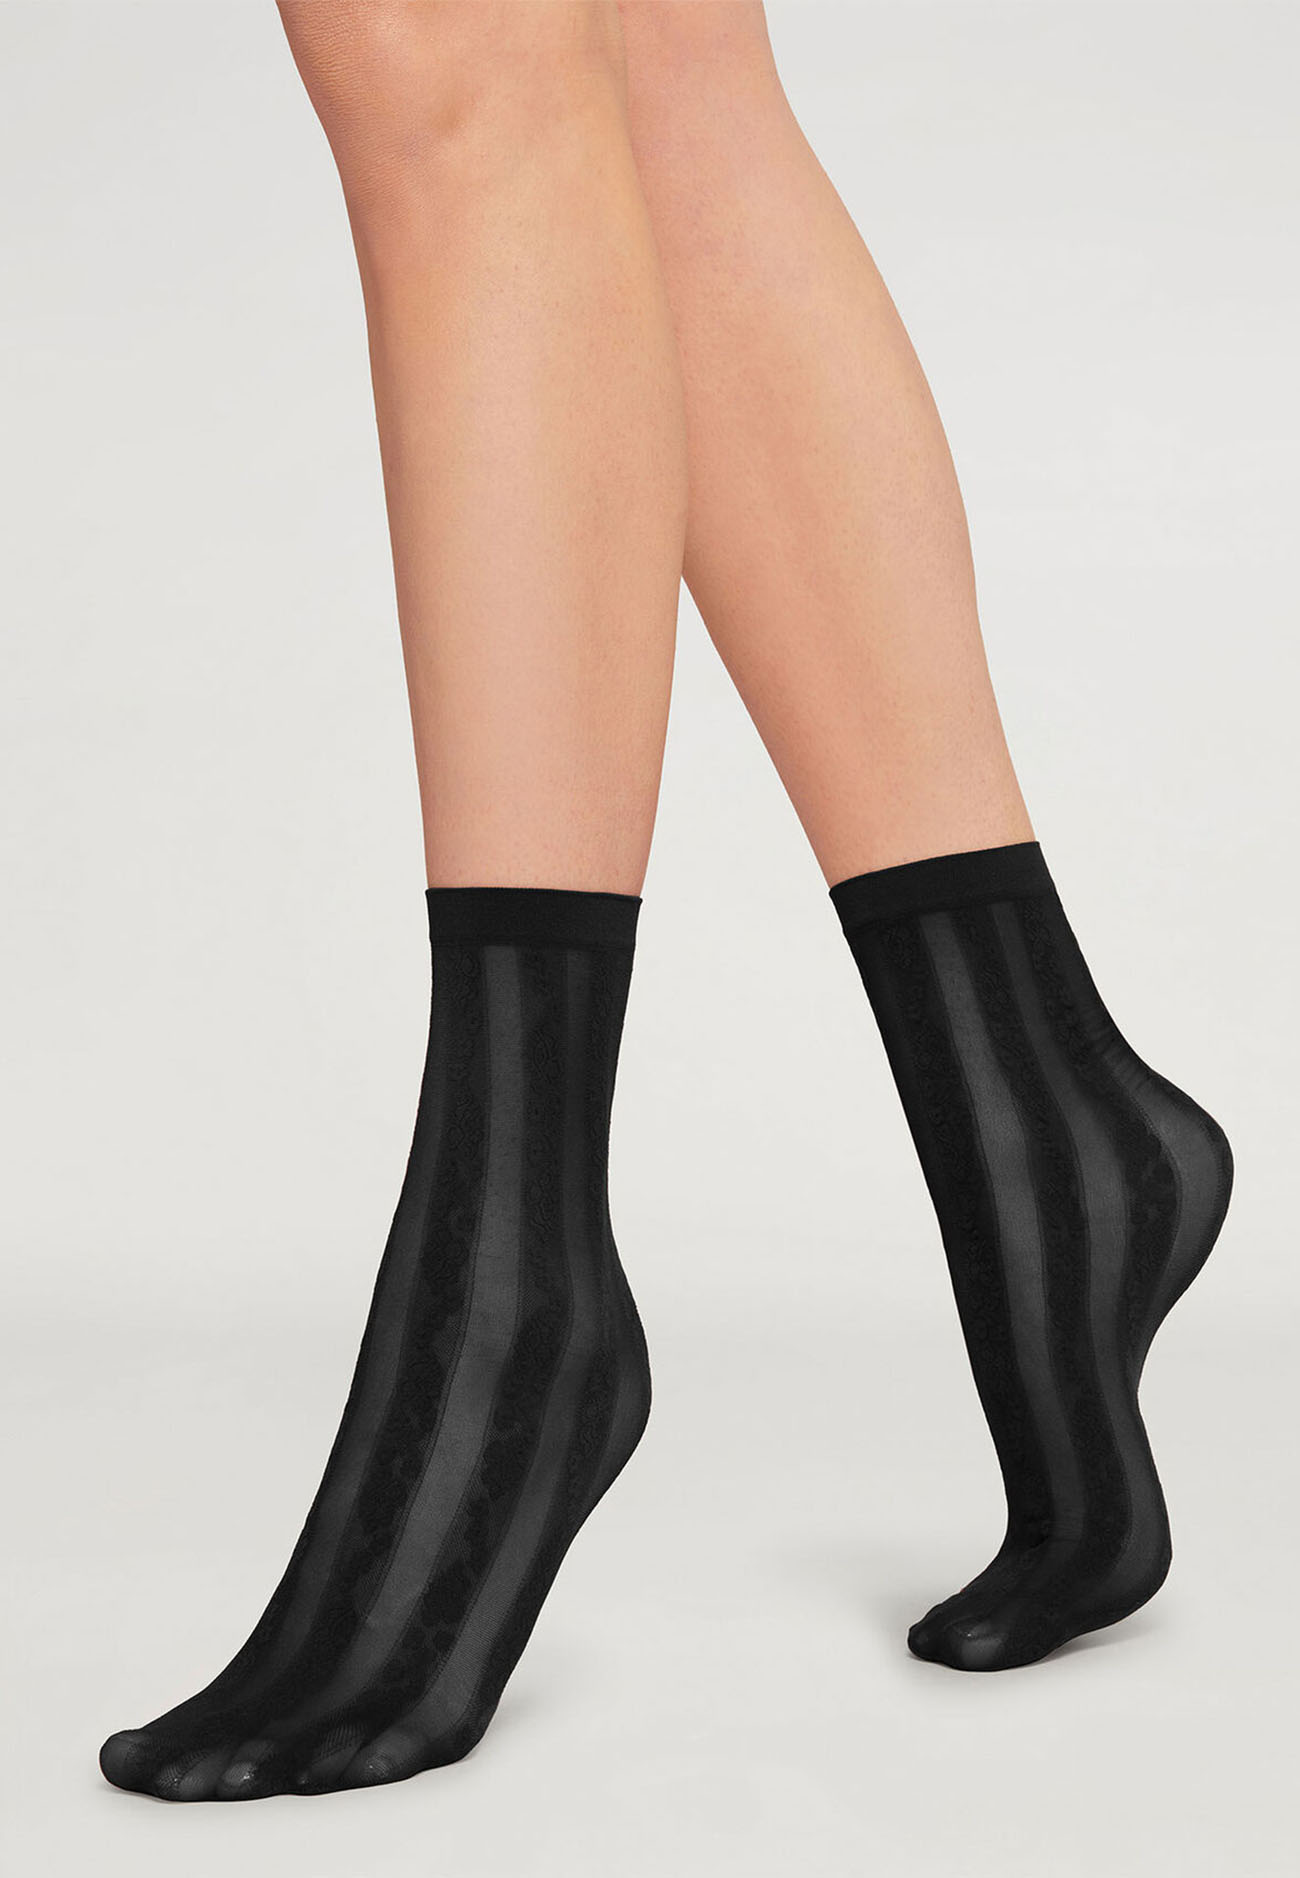 48052 Ruth Socks